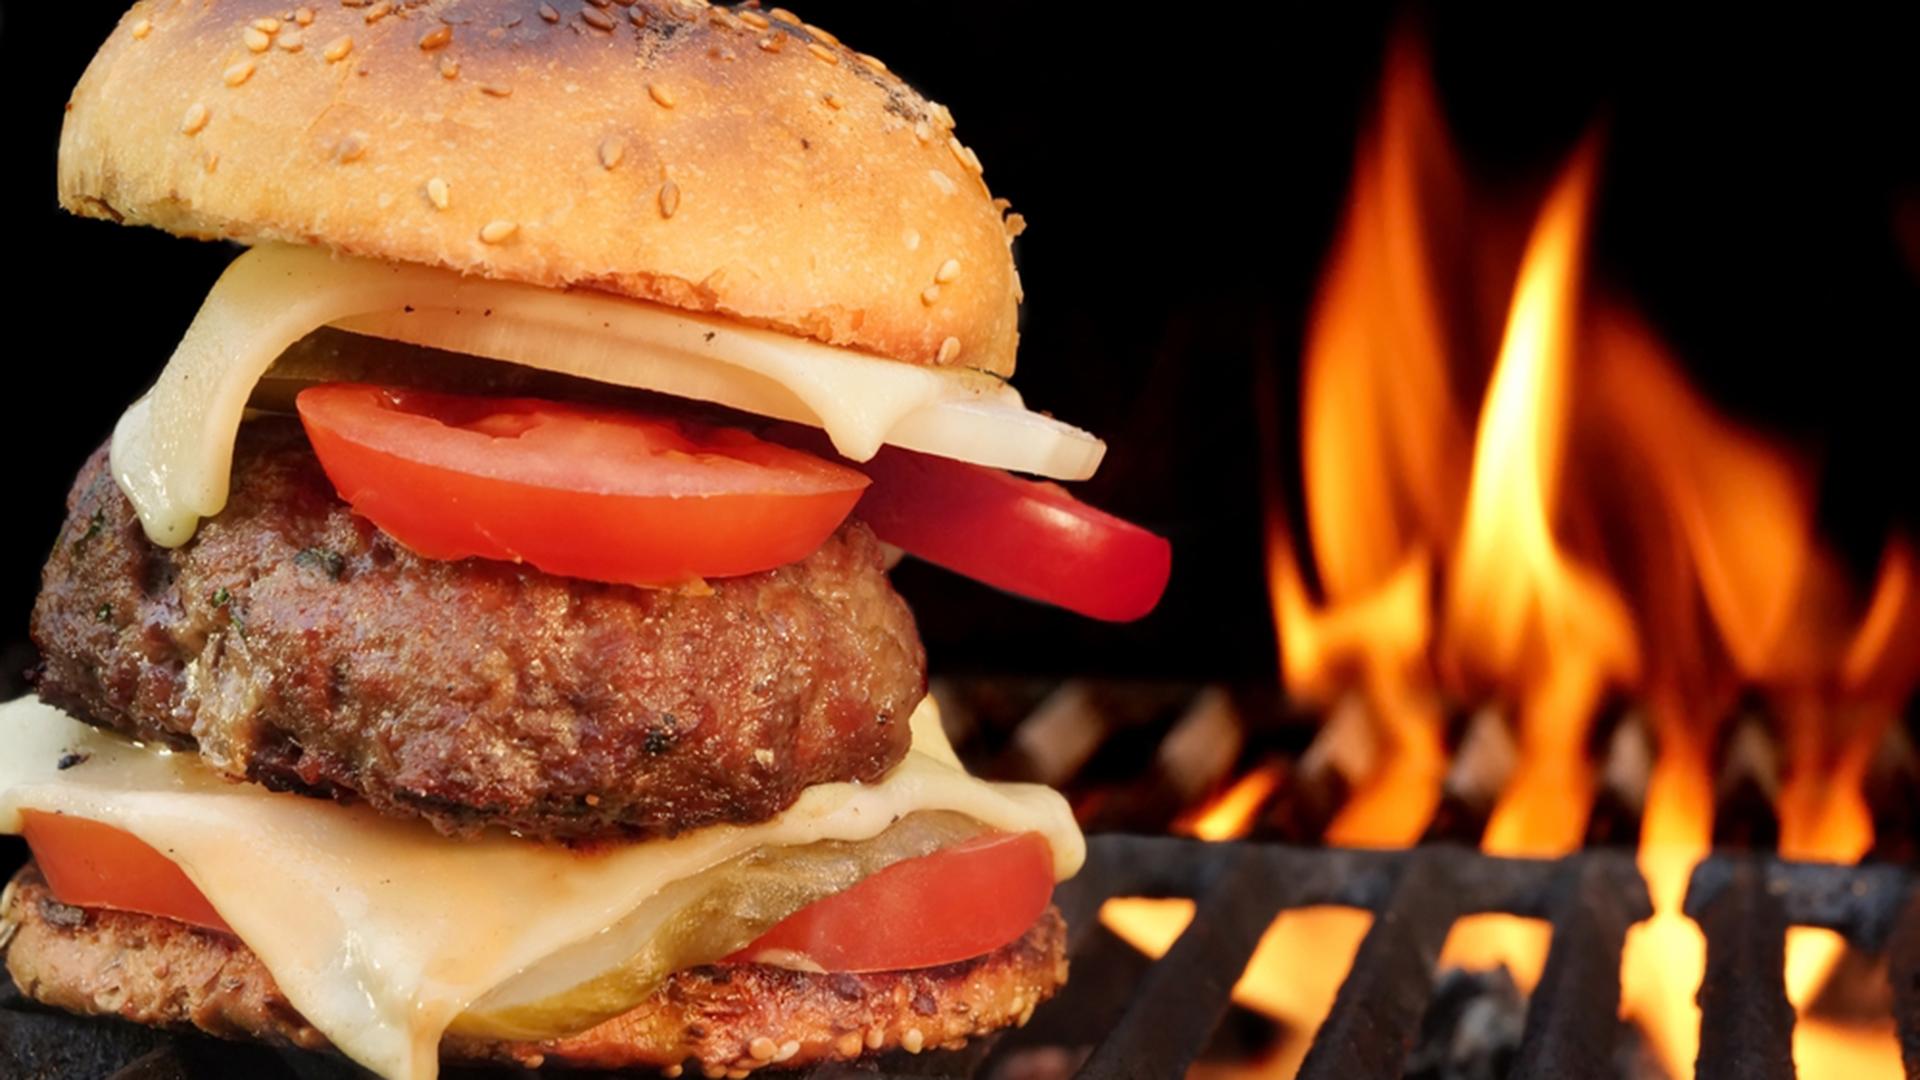 Amazing Wallpaper High Quality Burger - hamburger-grill-cheese-stock-today-150519-tease_13e9060c439353d6e8cf9b0686123a0a  Image_911223.jpg